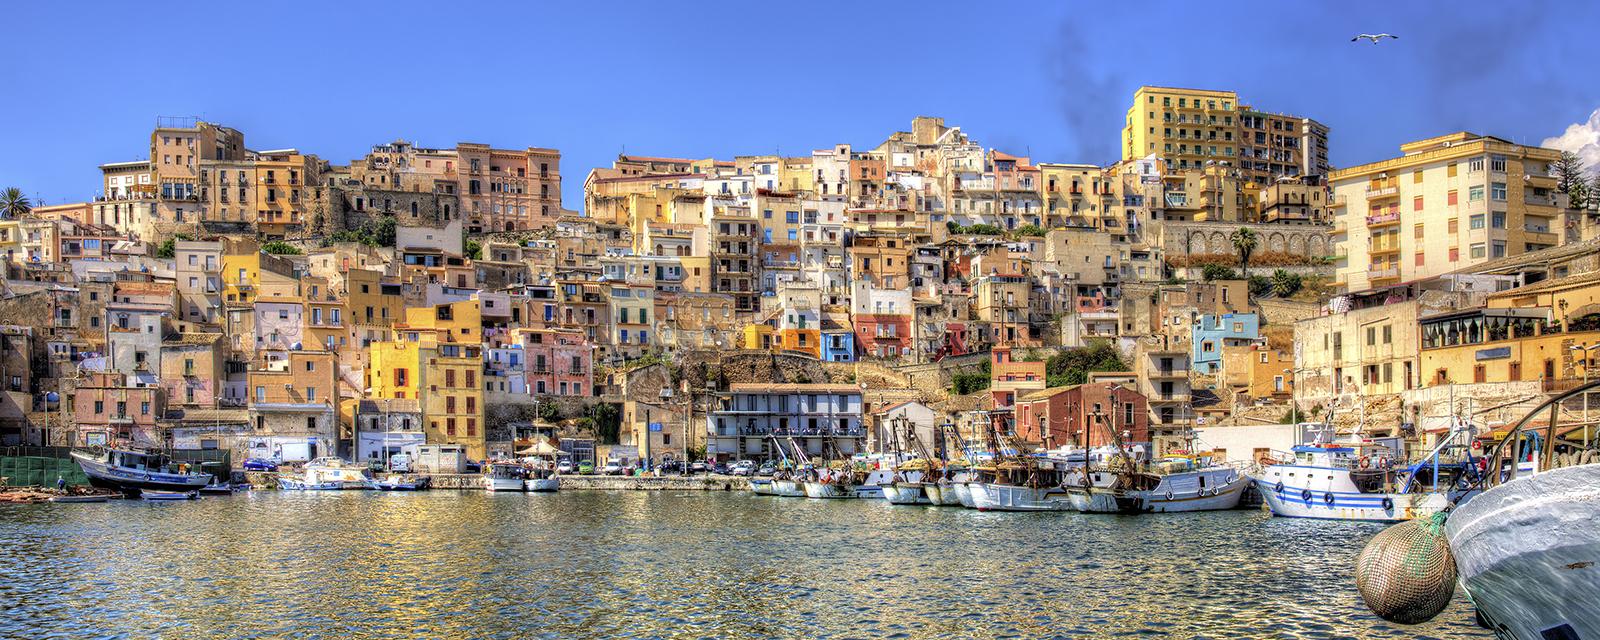 Luxury Villas In Sicily Oliver S Travels